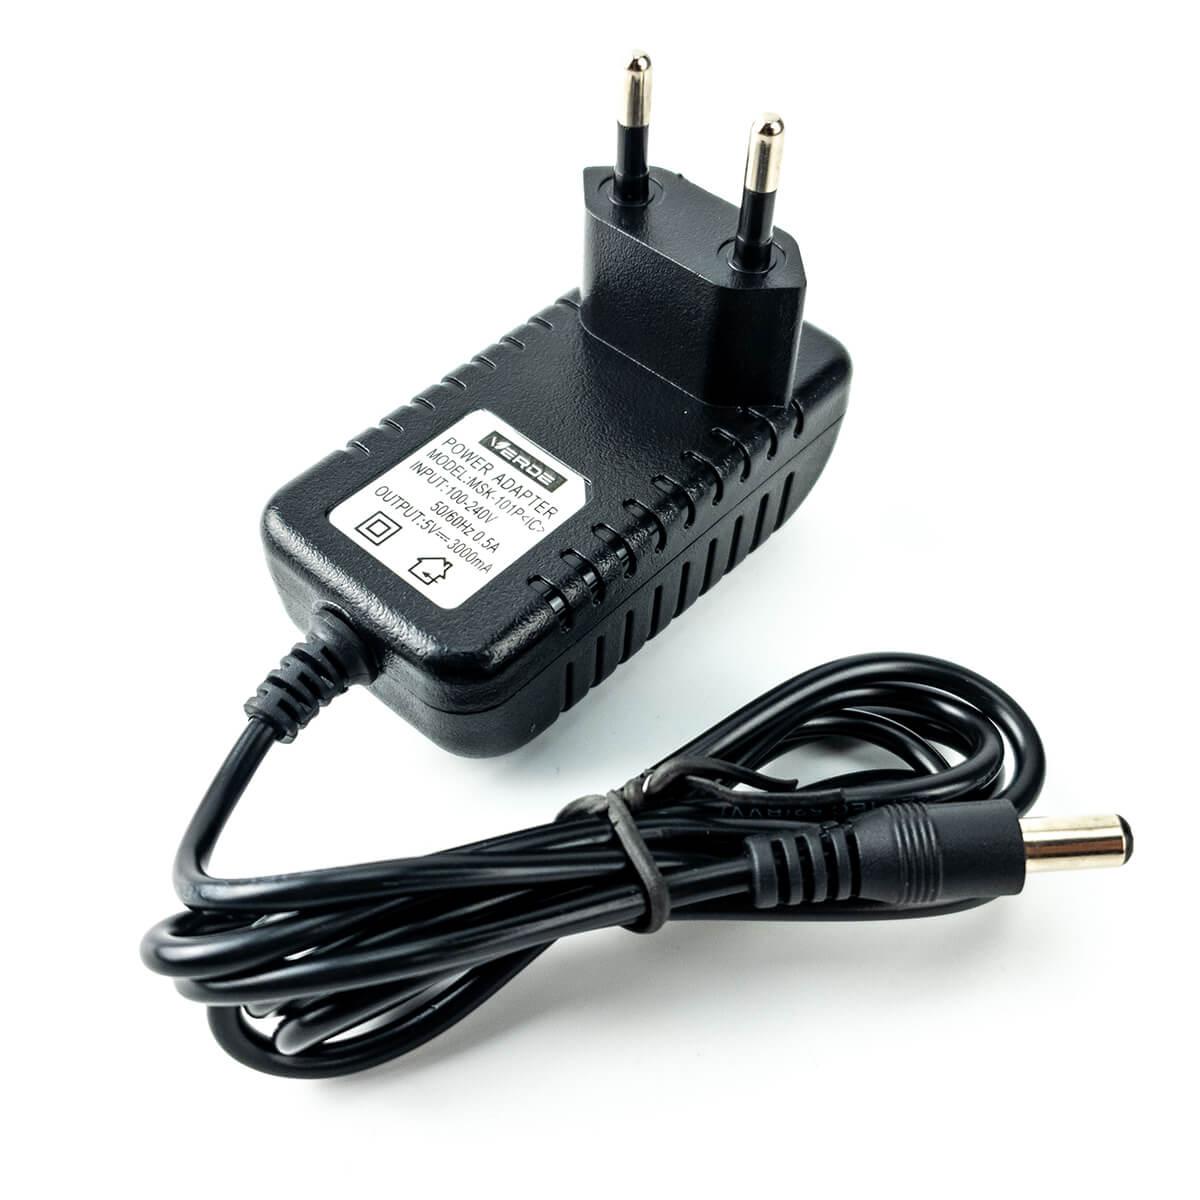 Fonte Chaveada 5V 1A Plug P4 5,5 x 2,5 mm Bivolt Verde MSK-101P